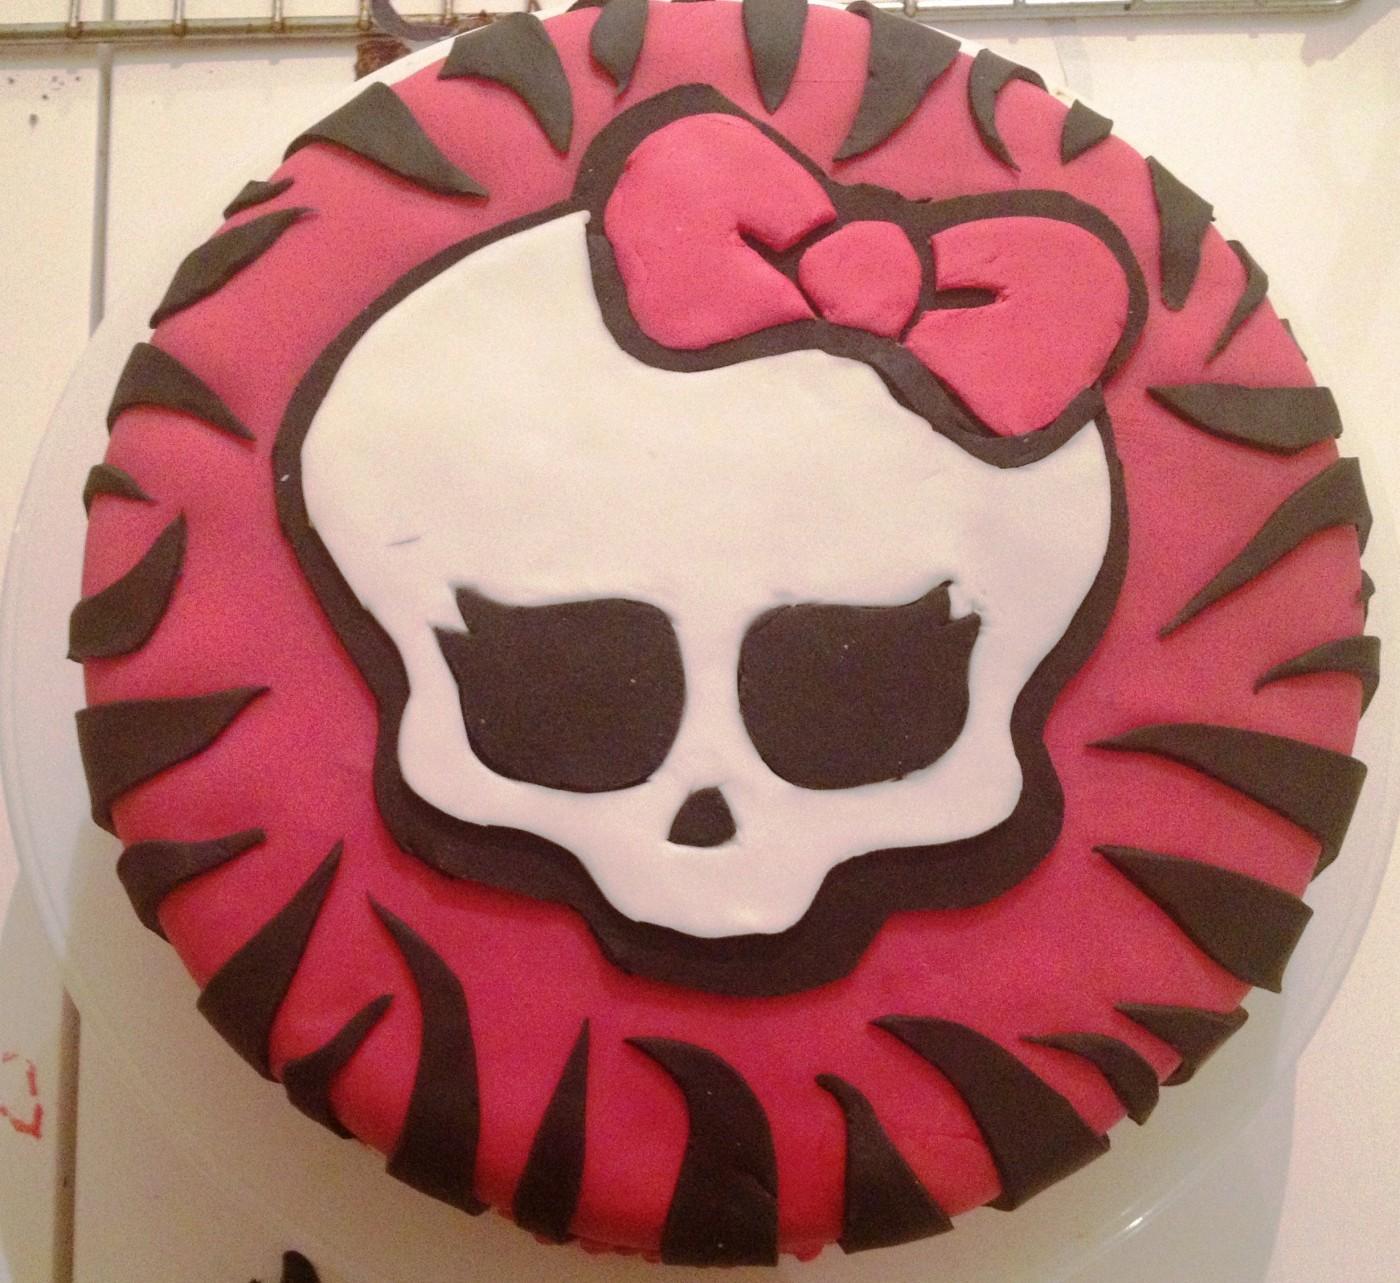 Gâteau à la demande